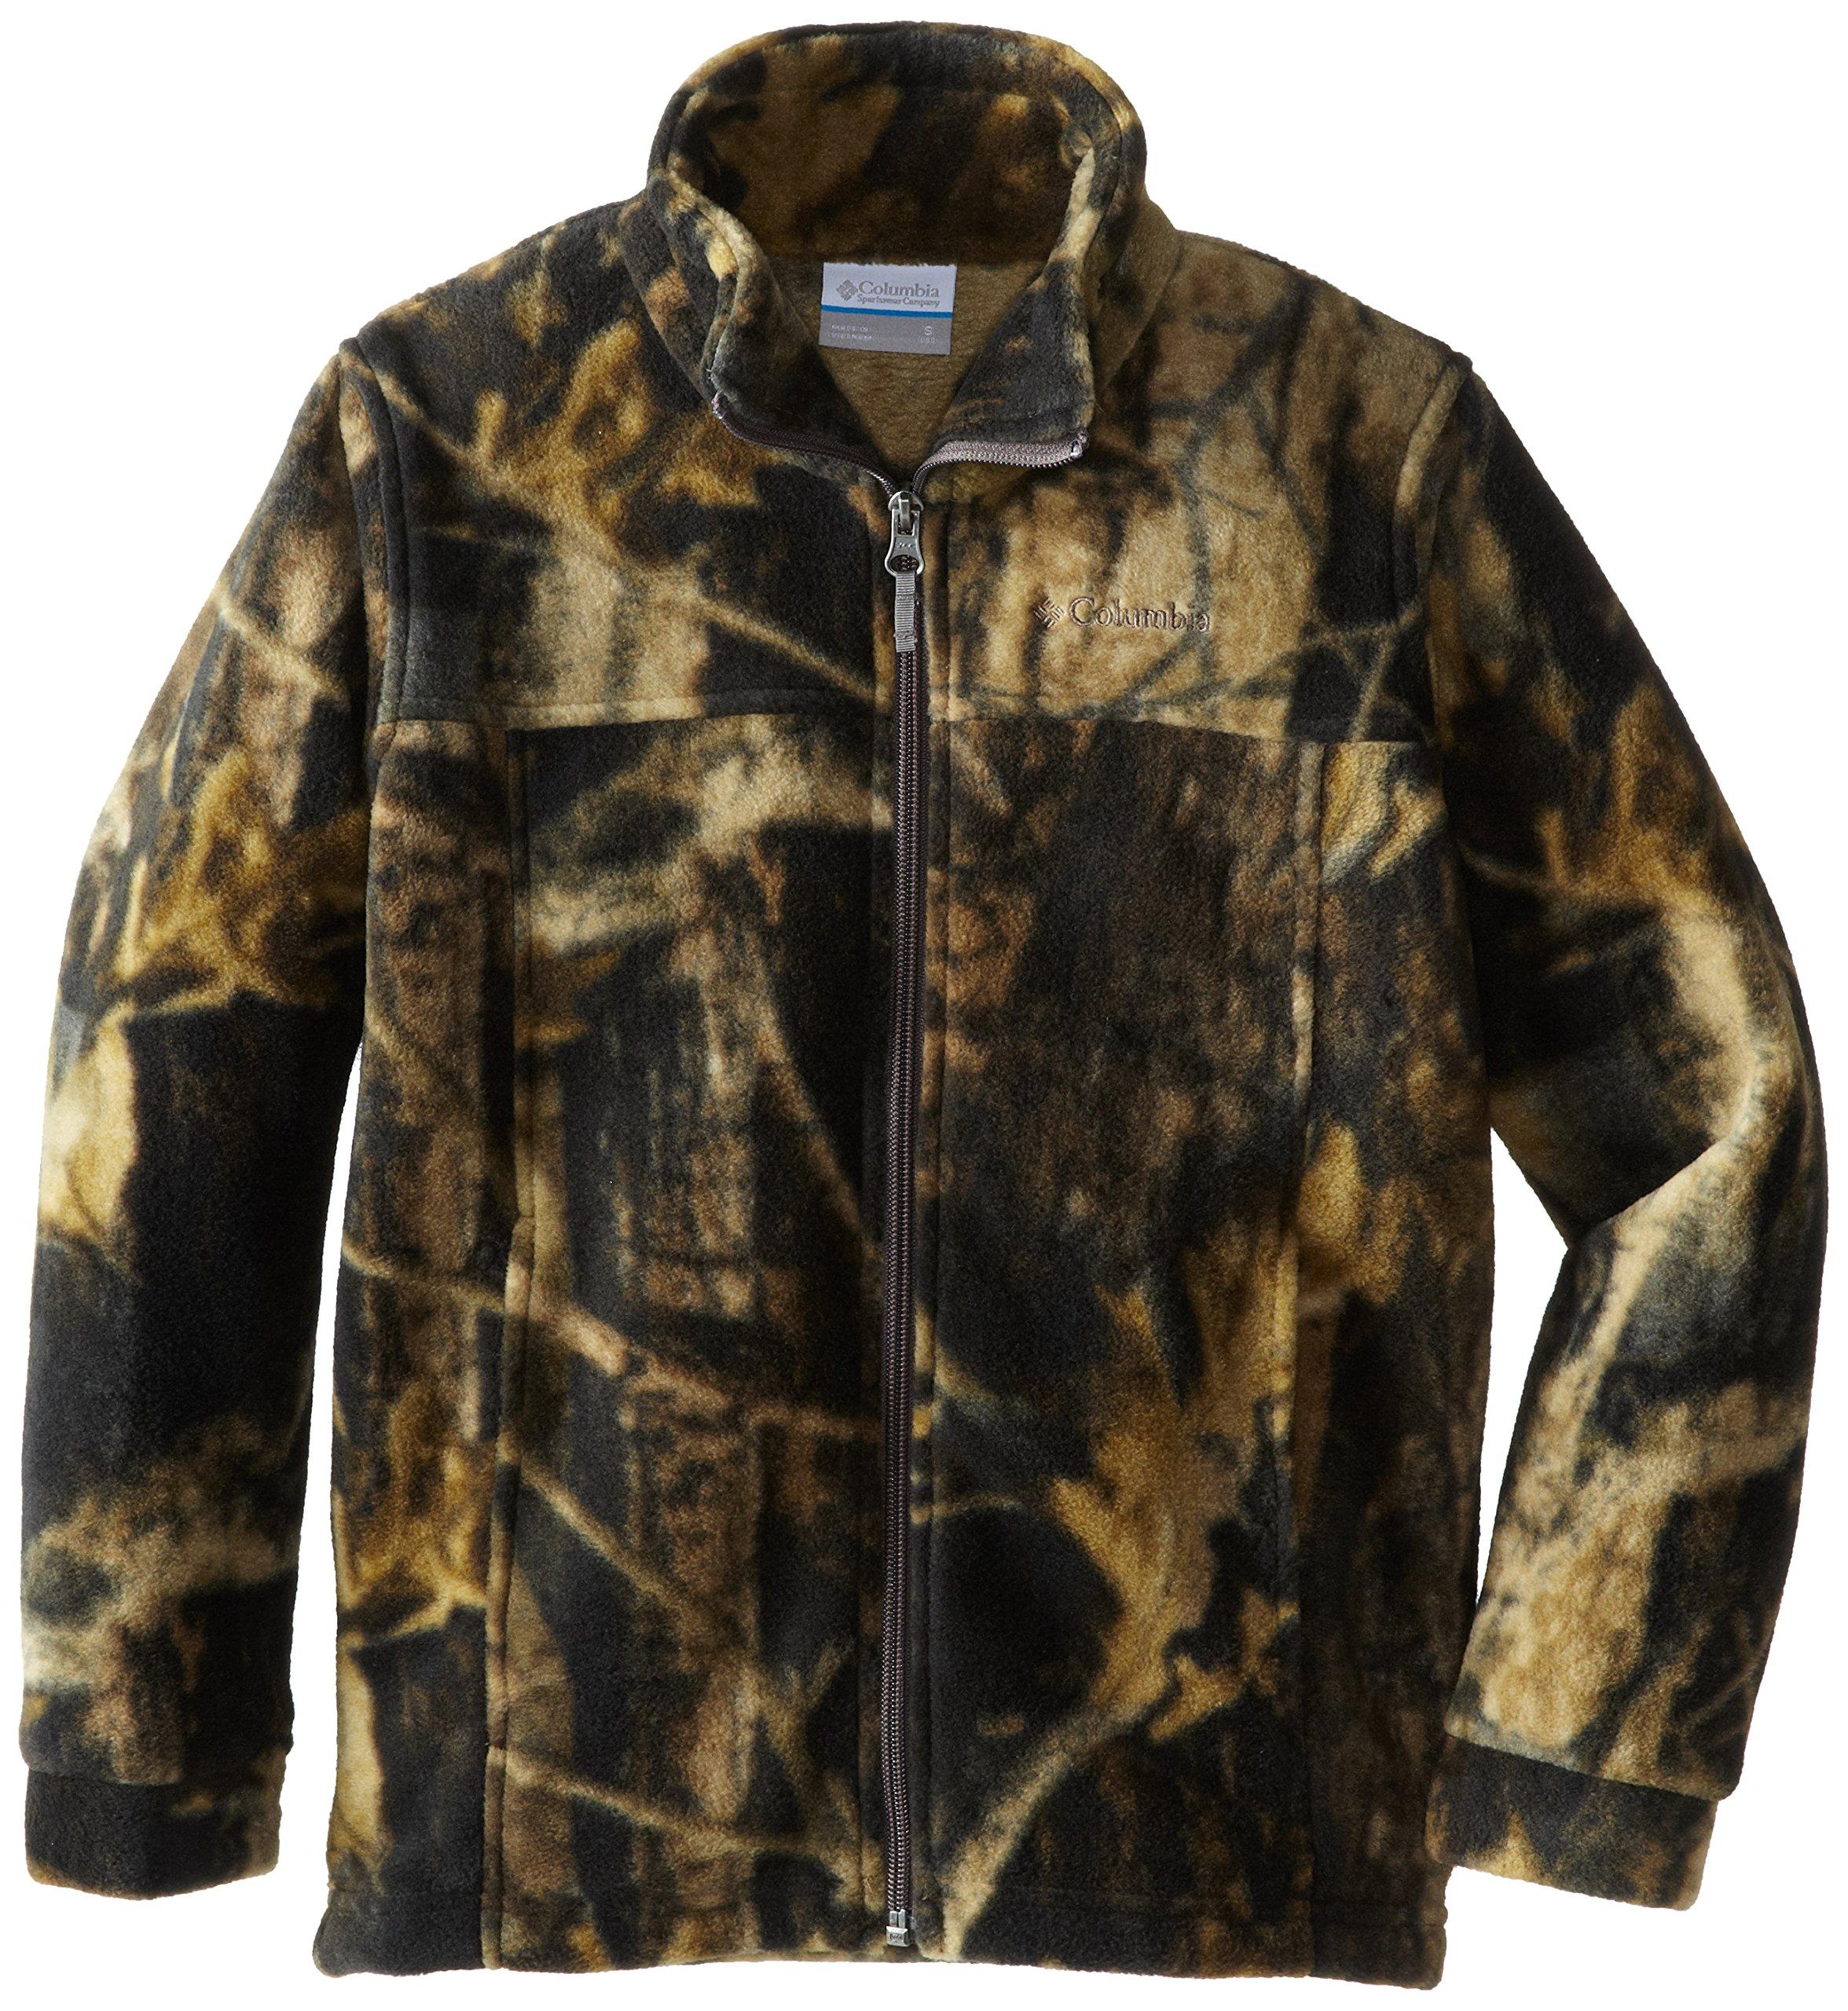 Columbia Big Boys' Zing lll Fleece Jacket, Timberwolf, Large